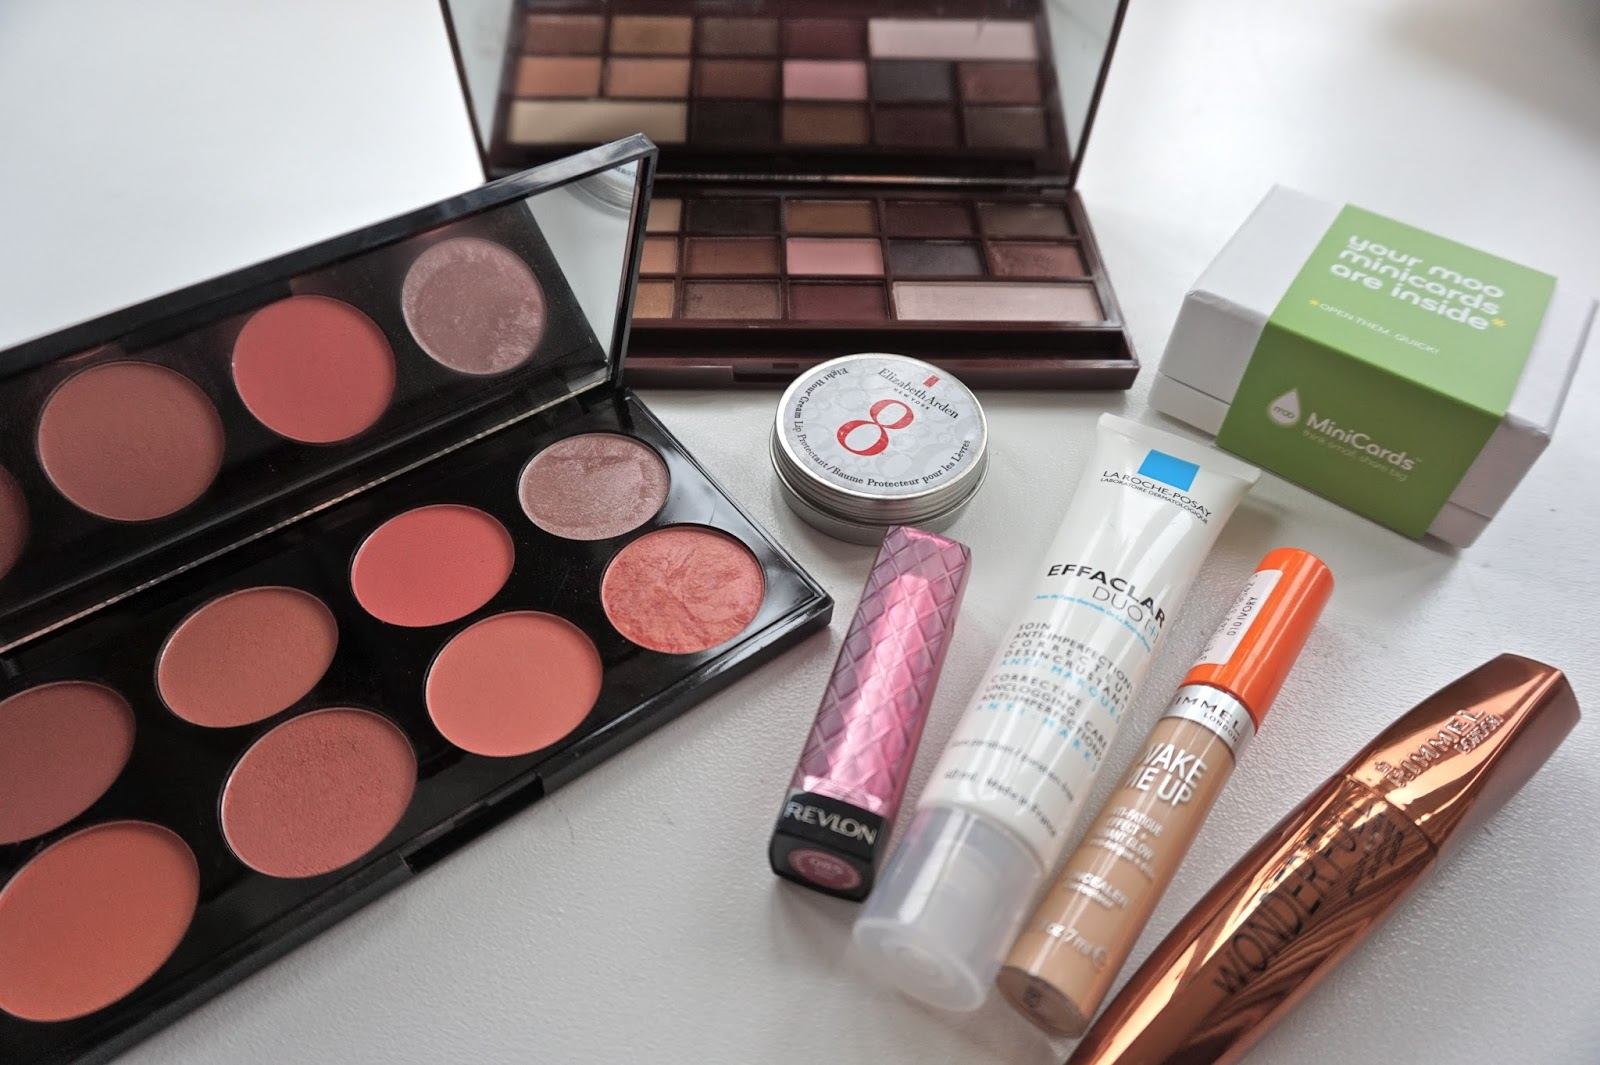 Makeup Revolution, Elizabeth Arden 8 Hour, Revlon, Rimmel, La Roche Posay, MOO Business Cards